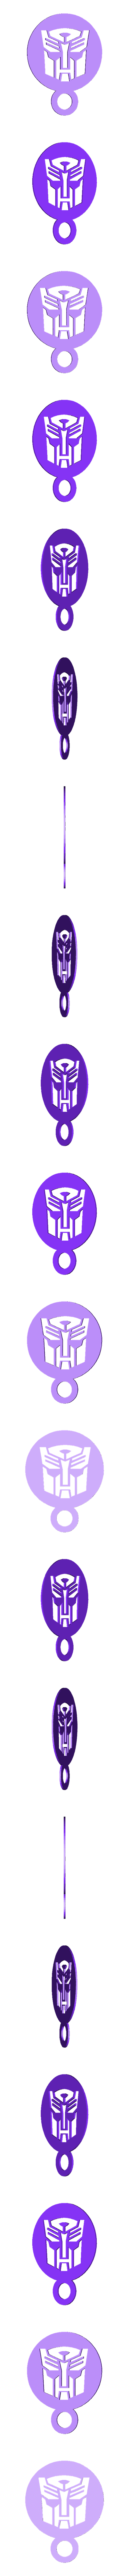 autobot_logo.STL Download free STL file coffee Stencil - Autobot Logo or upside down Darthwader • Object to 3D print, arifsethi